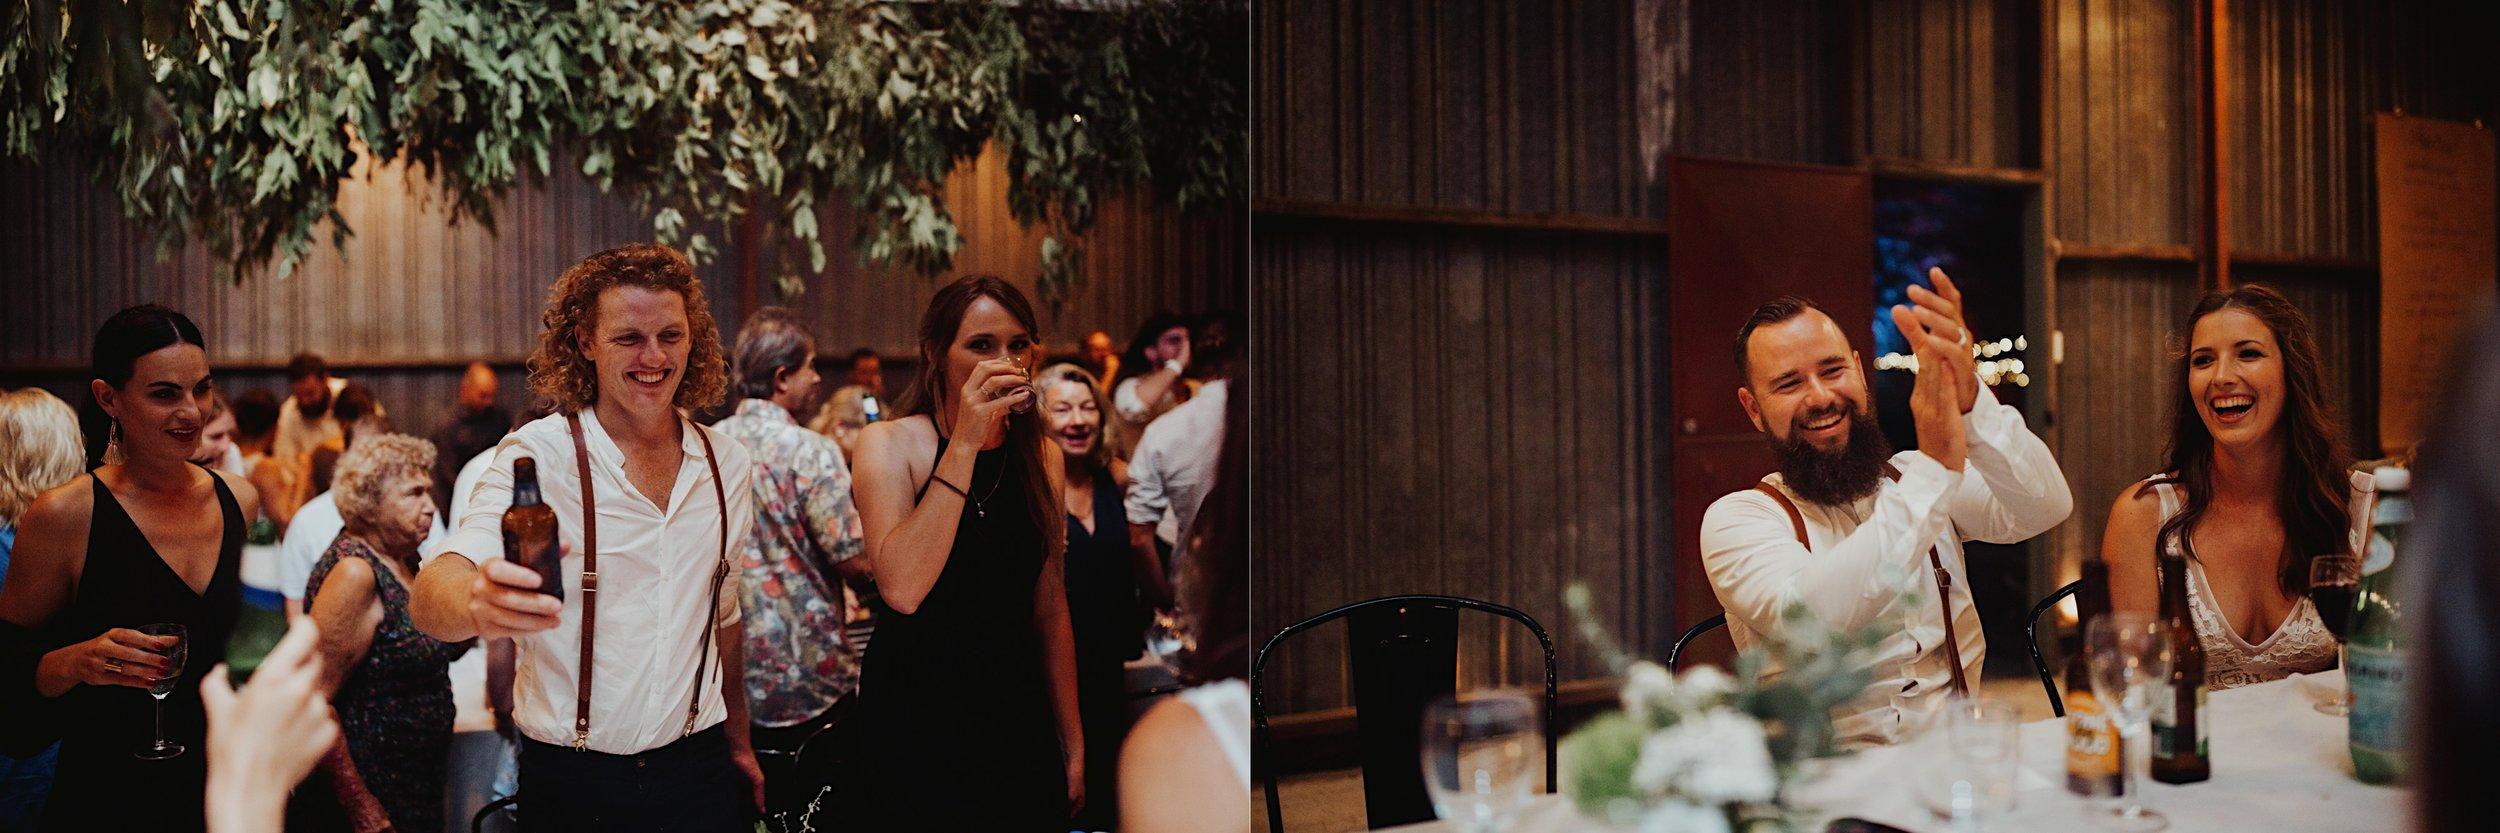 AustraliaweddingTom 0125.jpg